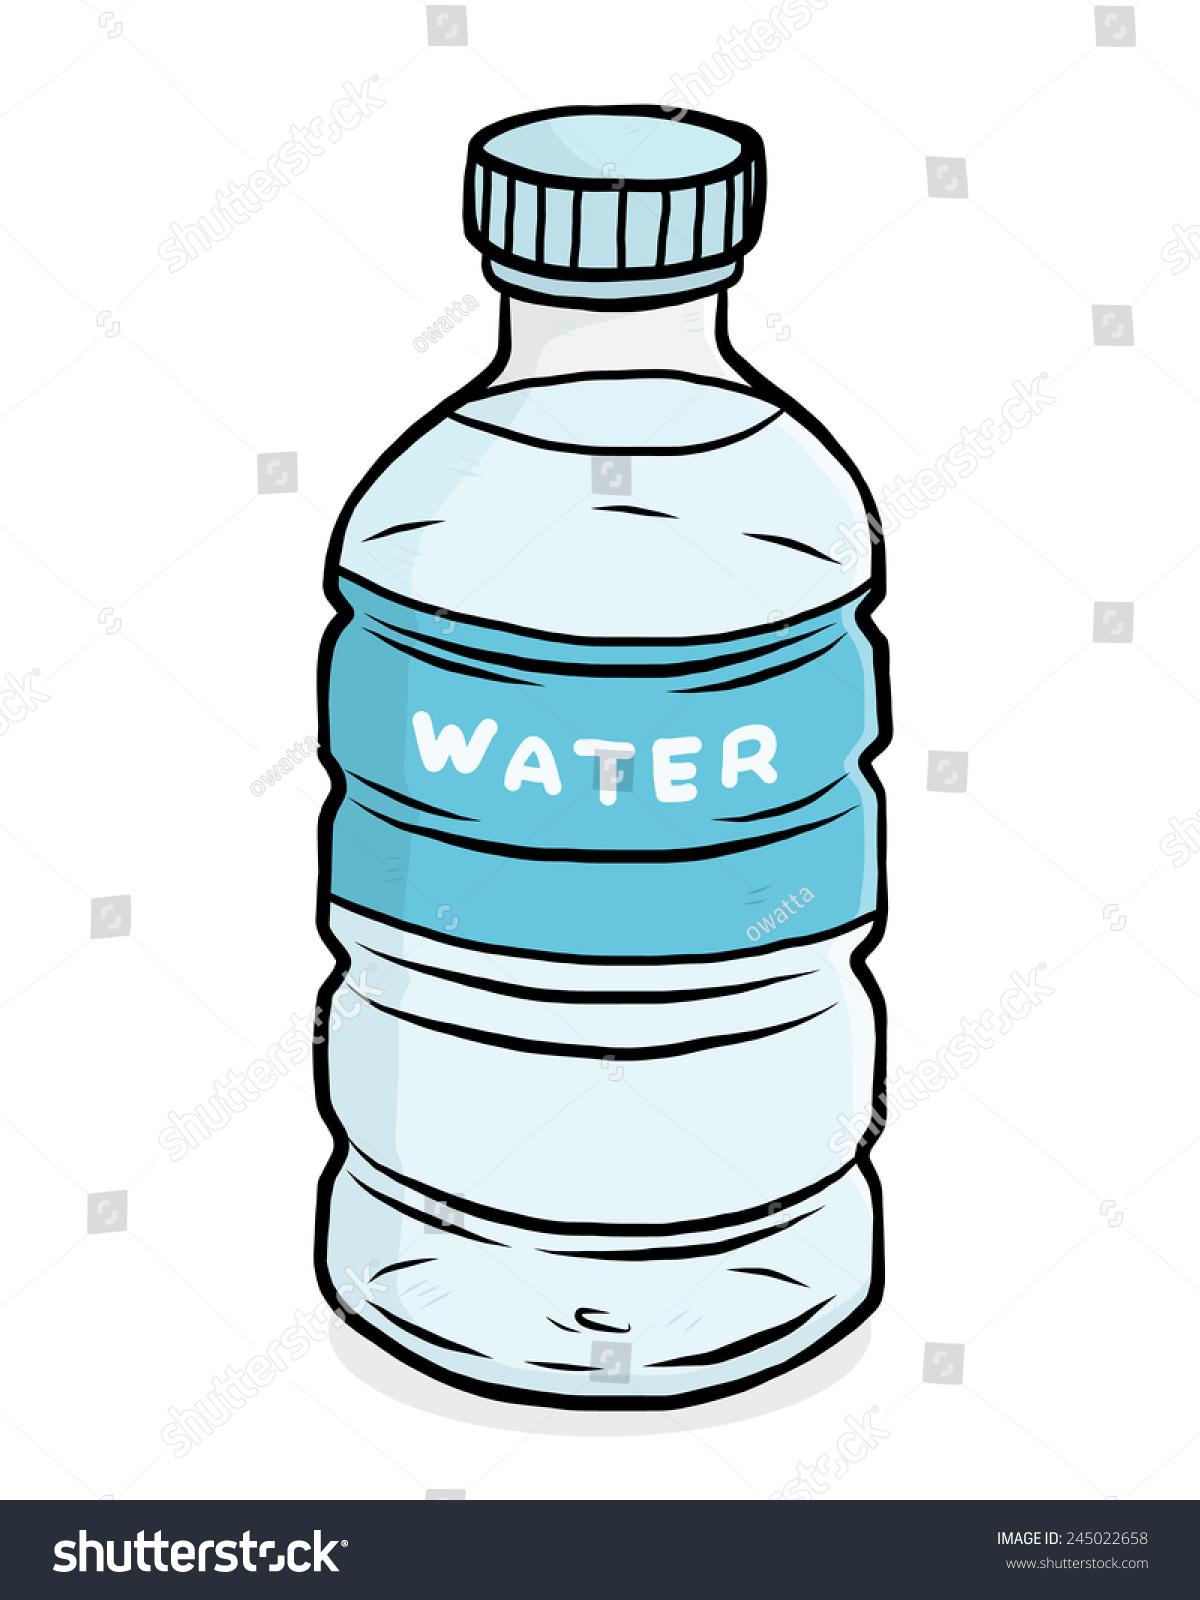 royalty free water plastic bottle cartoon vector 245022658 stock